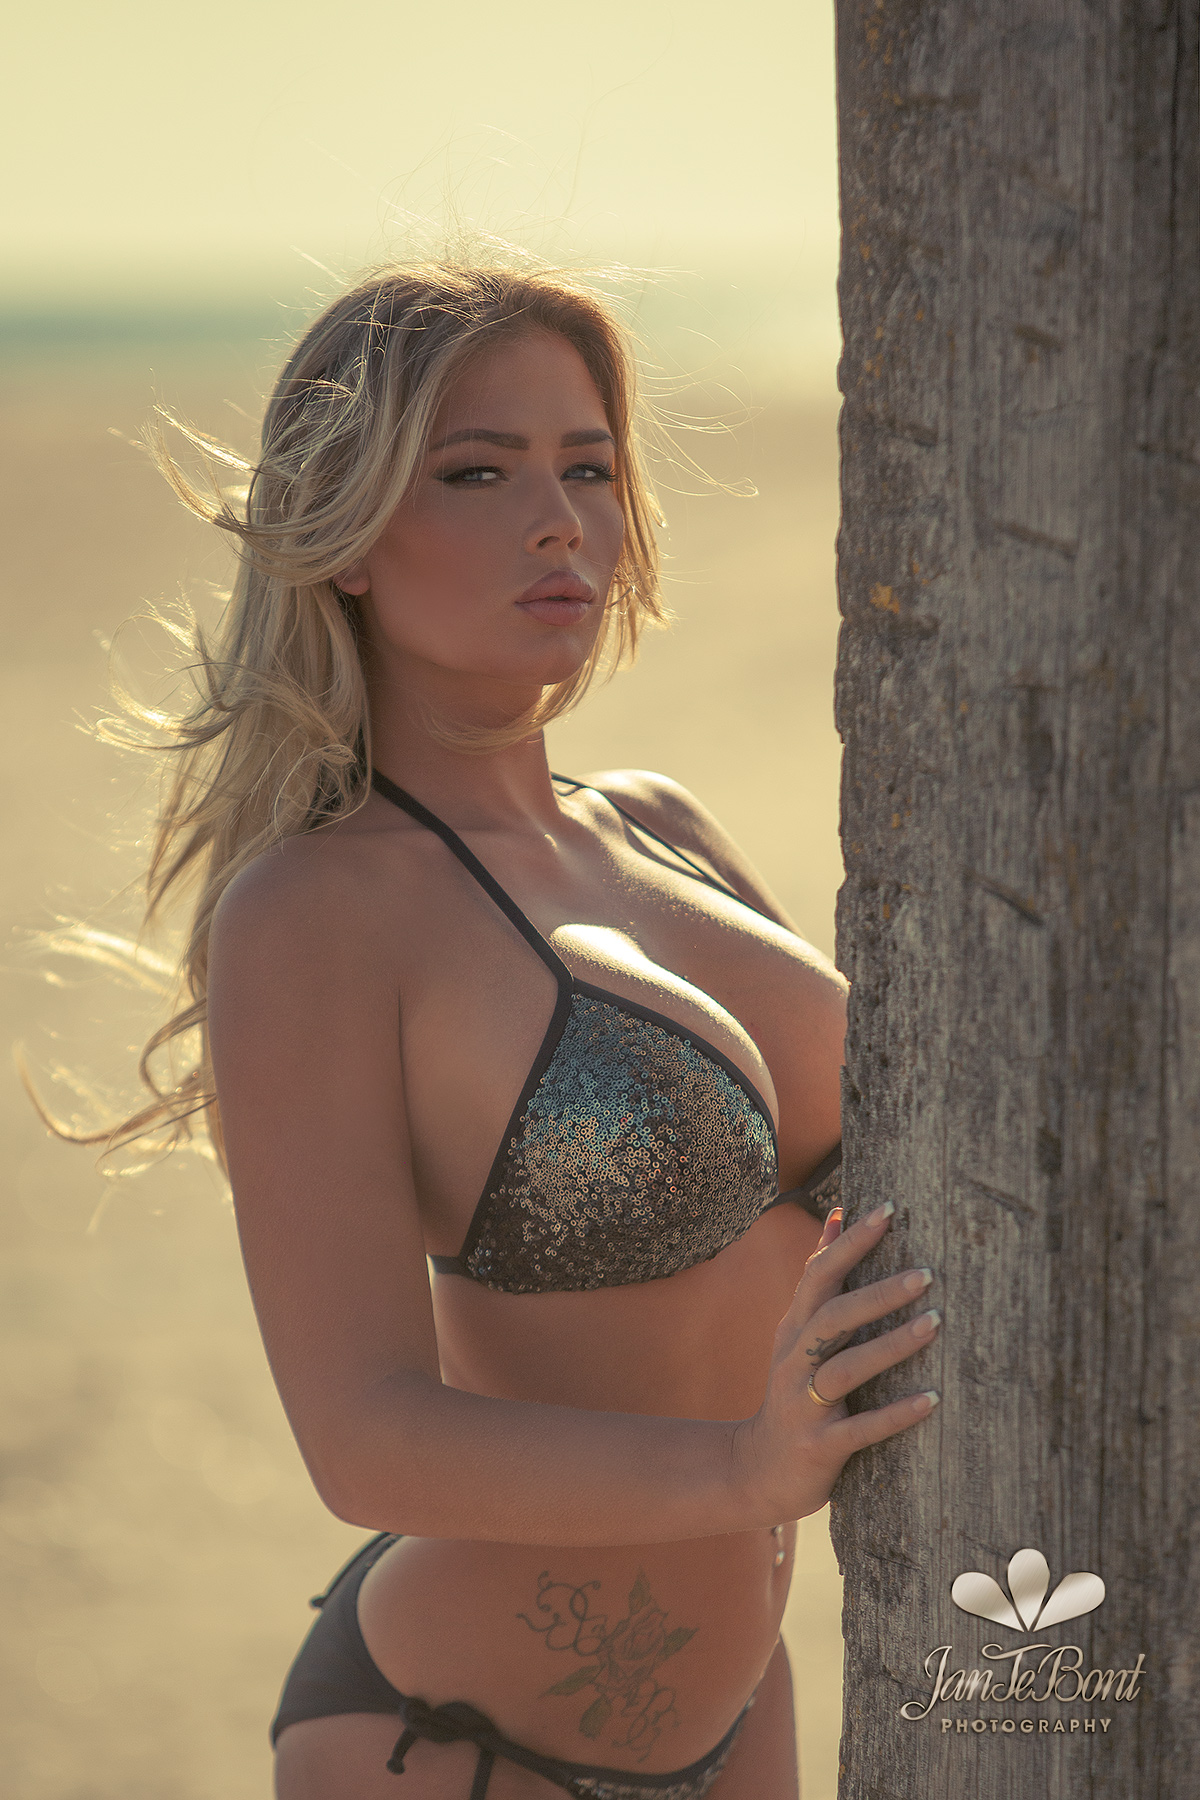 Fabienna Valentina blonde barbie lips longhair model glamour busty big boobs beauty sexy perfect girl lady woman jan te bont jantebont JTB doutze